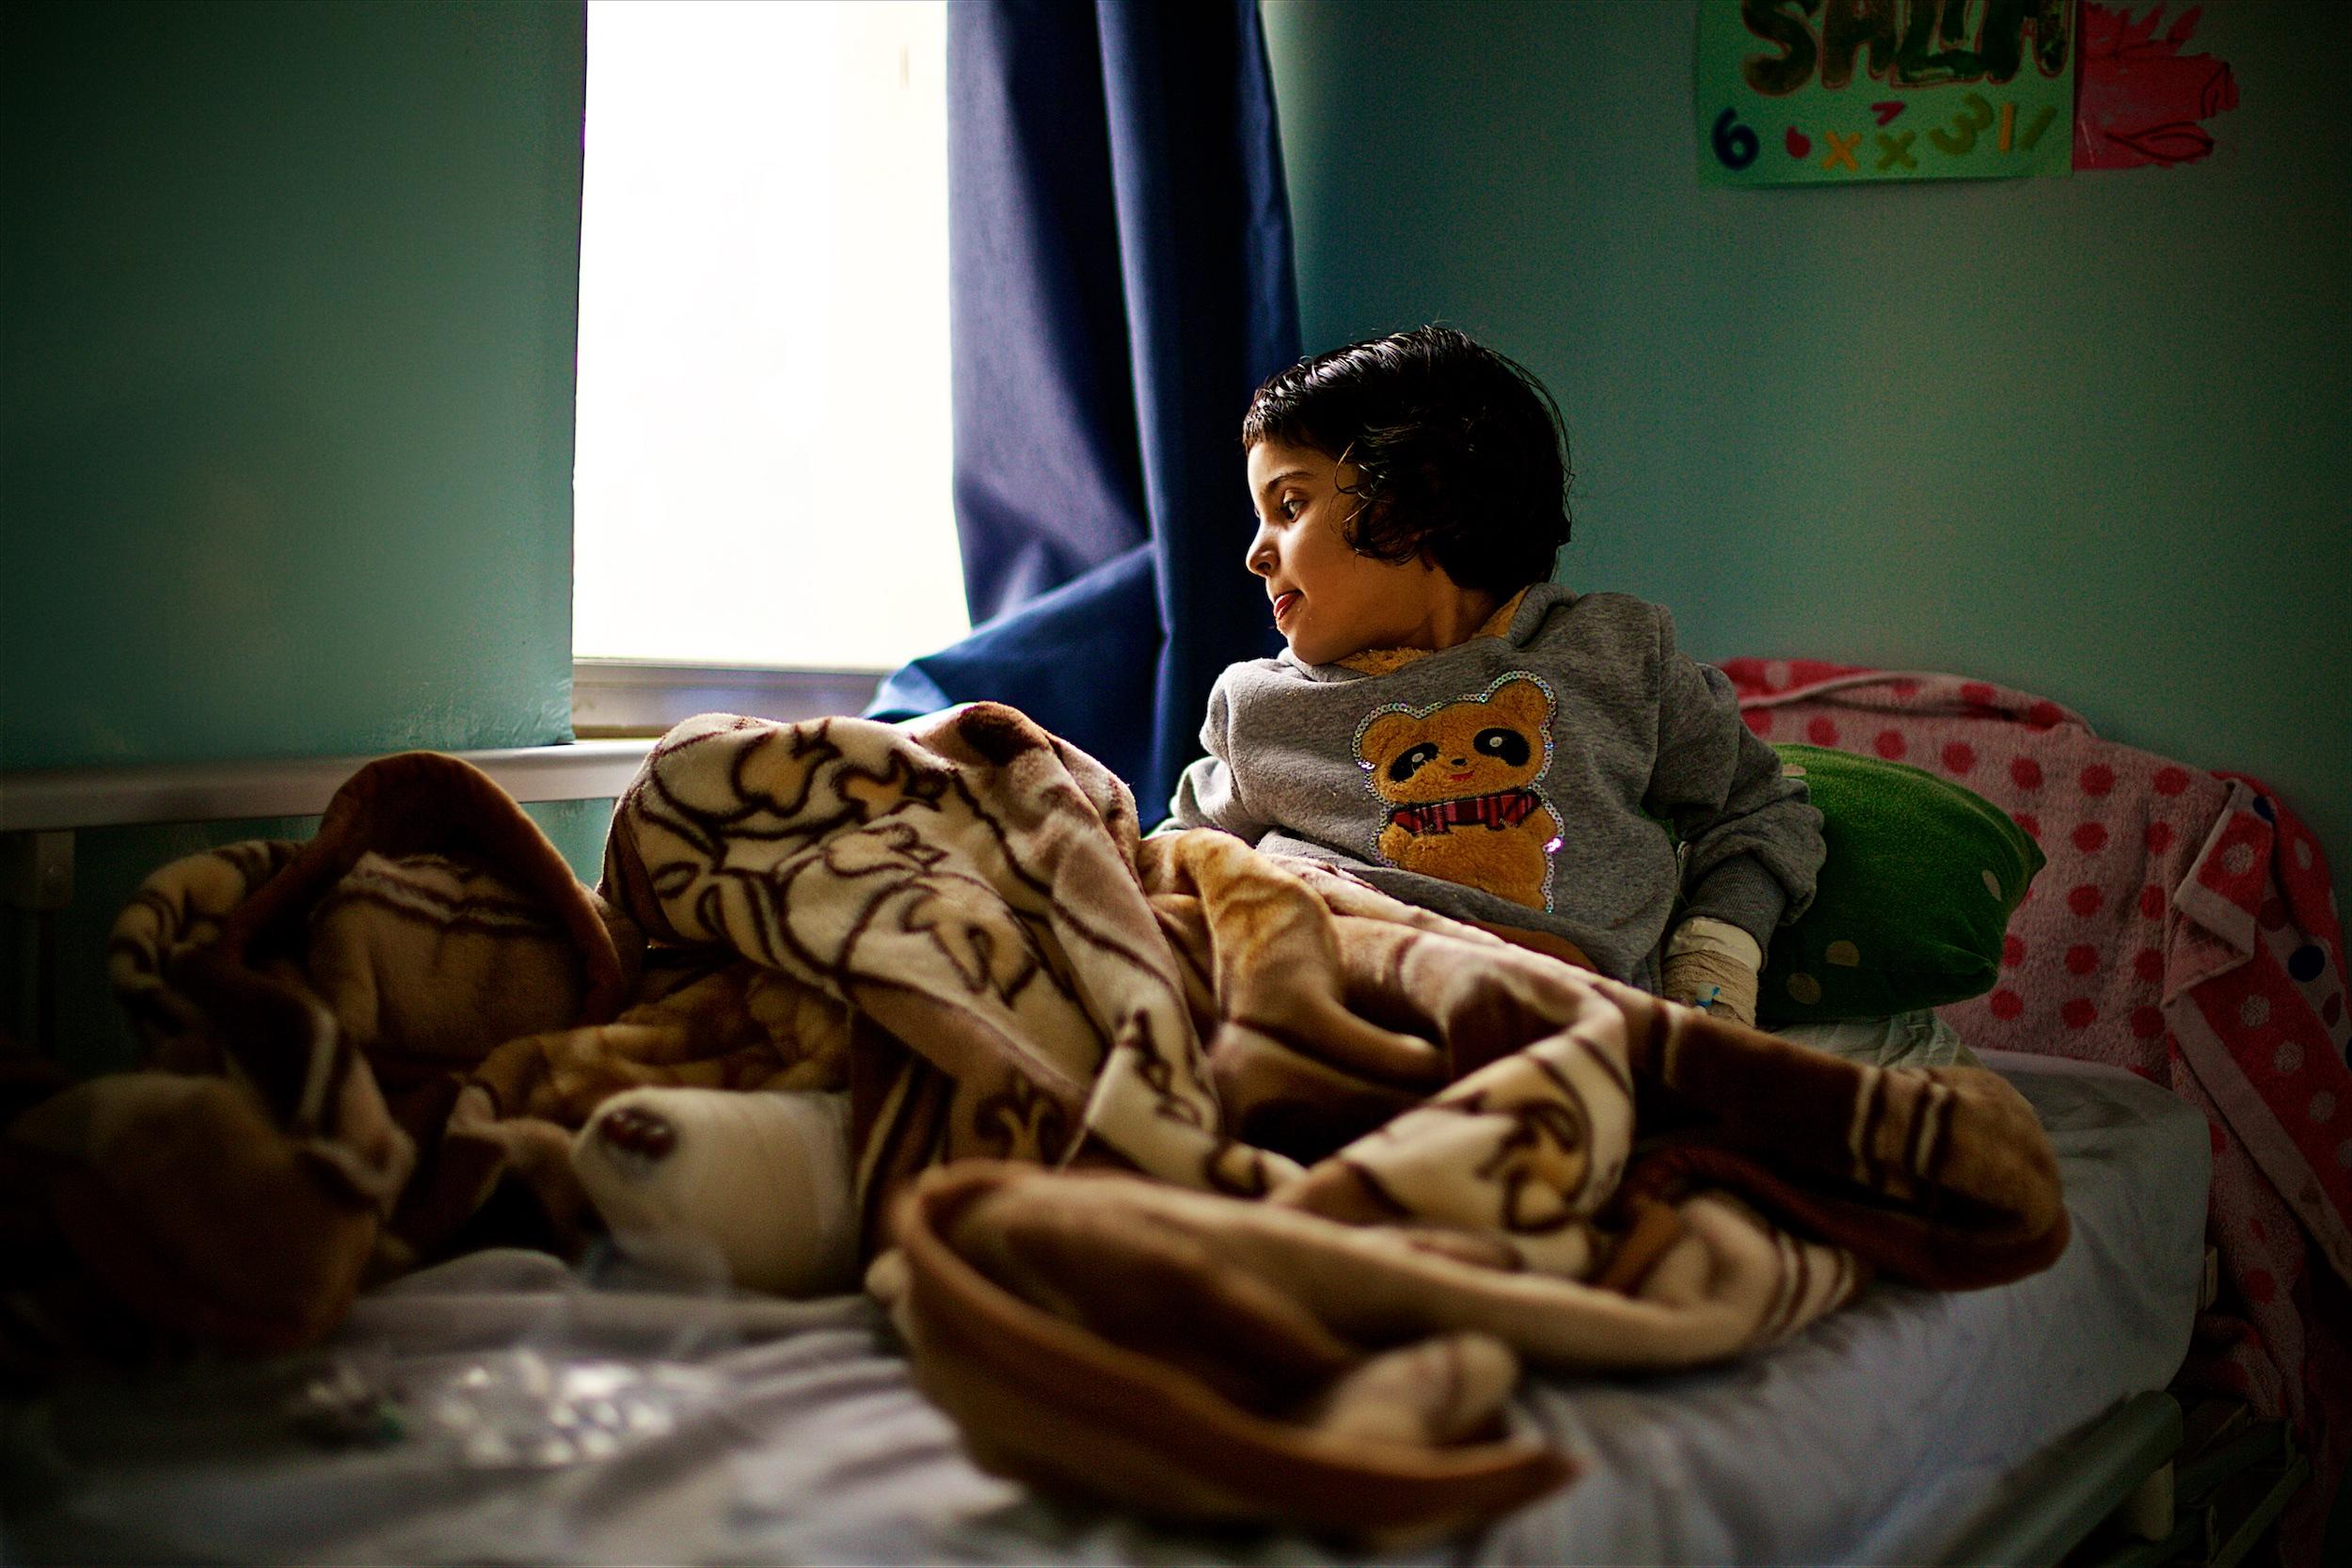 jordan-msf-al-ramtha-dectors-without-borders-war-hospital-refugee-camp-denis-bosnic-27.jpg